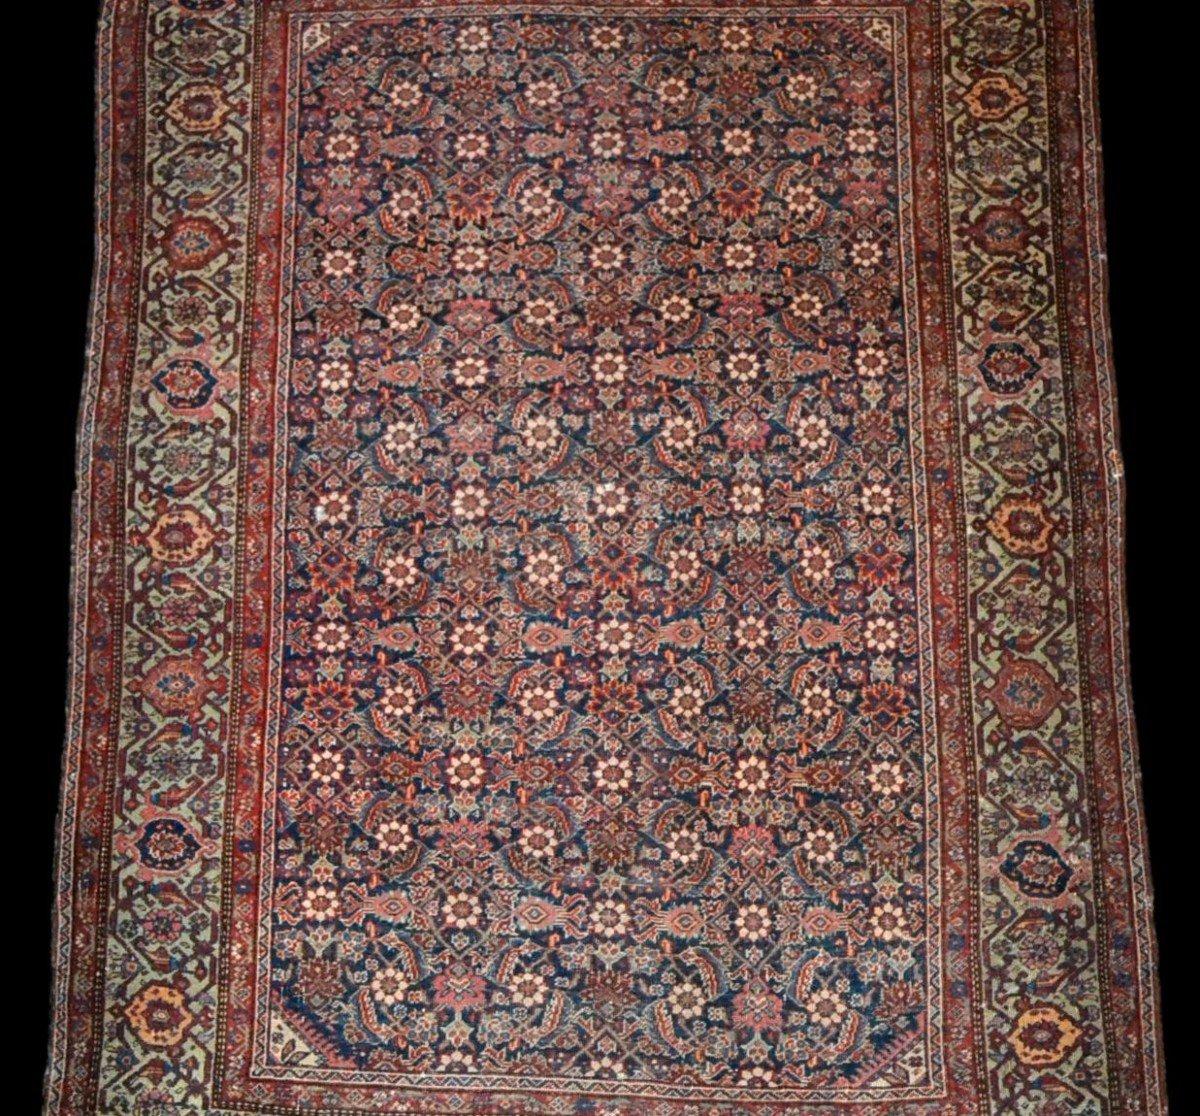 Tapis Persan Feraghan ancien, 131 cm x 185 cm, Iran, XIXème siècle, bel état collection-photo-3